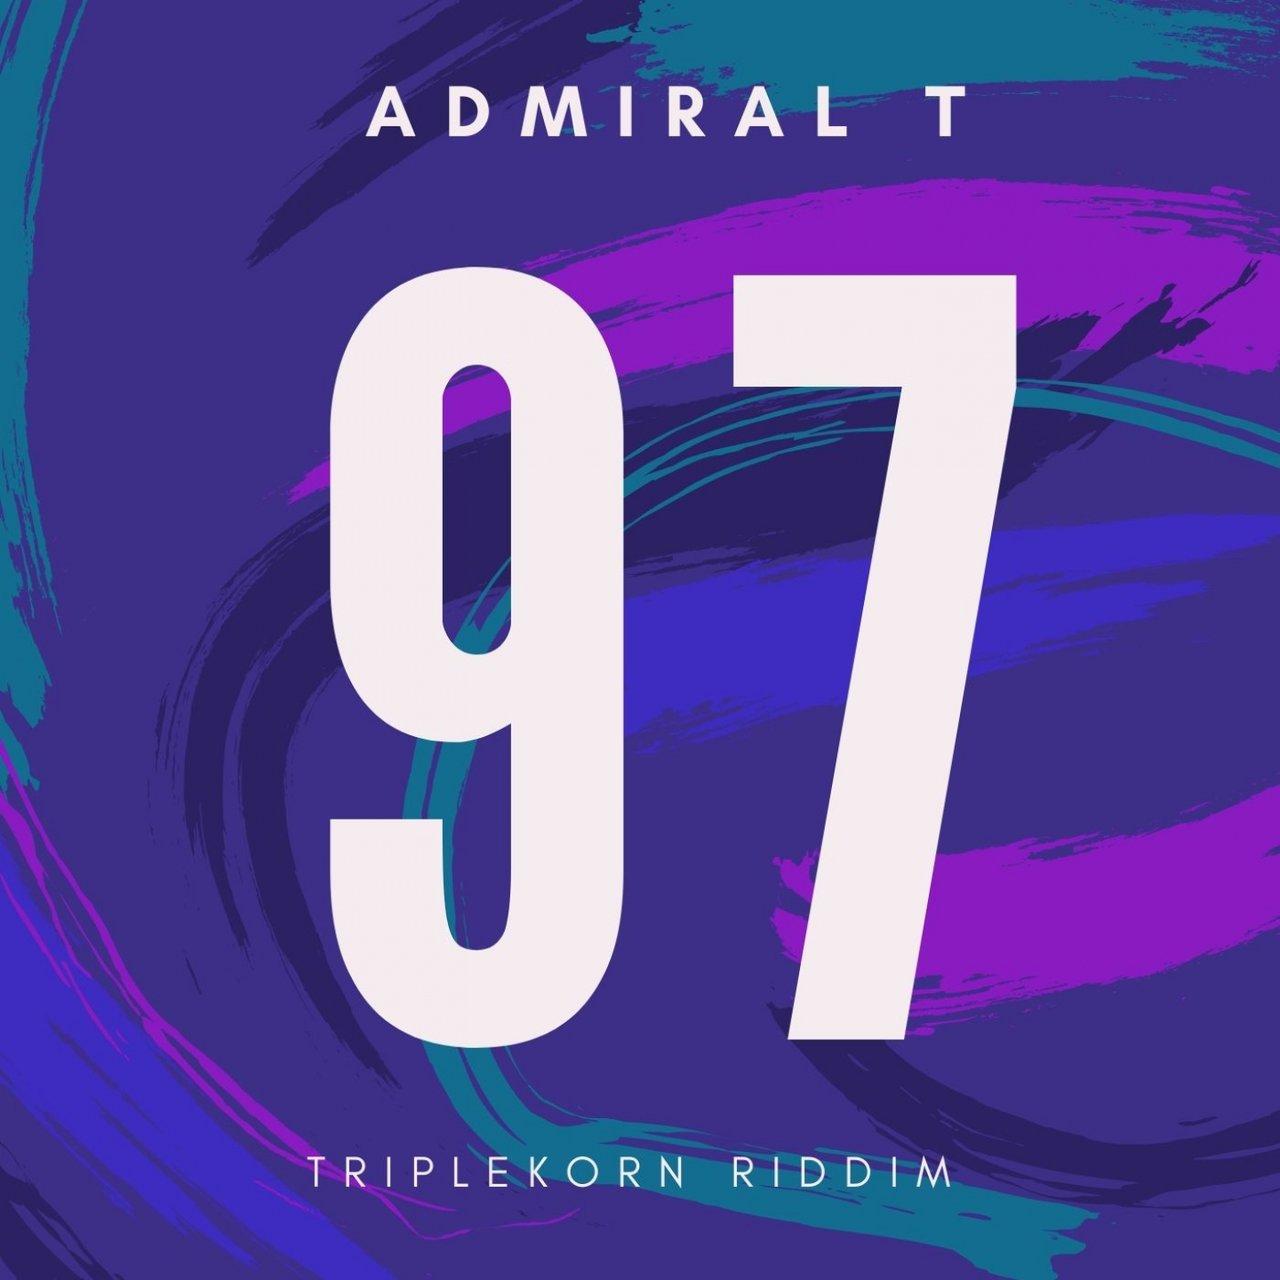 Admiral T - 97 (TripleKorn Riddim) (Cover)